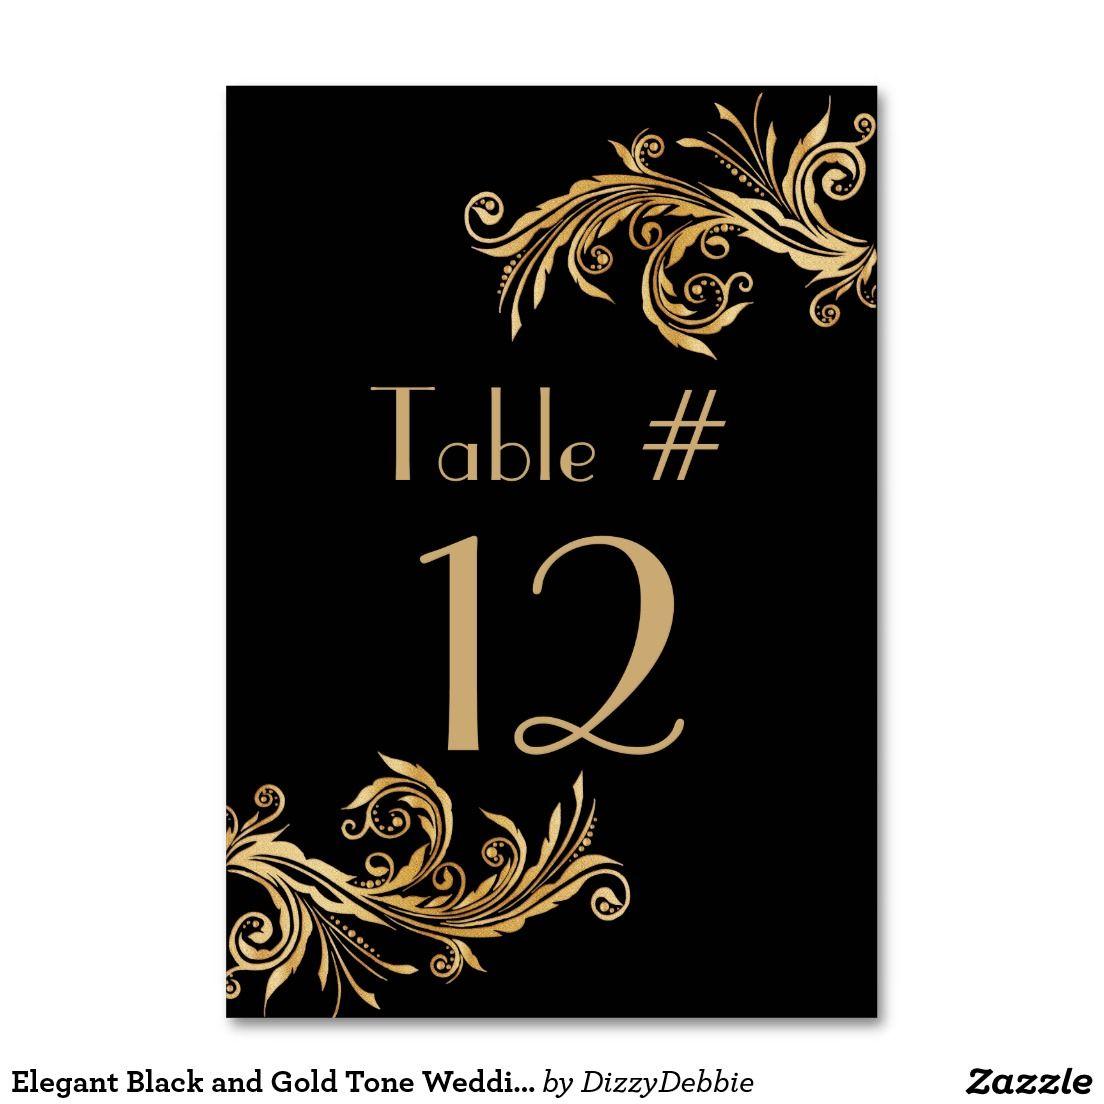 Elegant Black and Gold Tone Wedding Table Number | Wedding ...